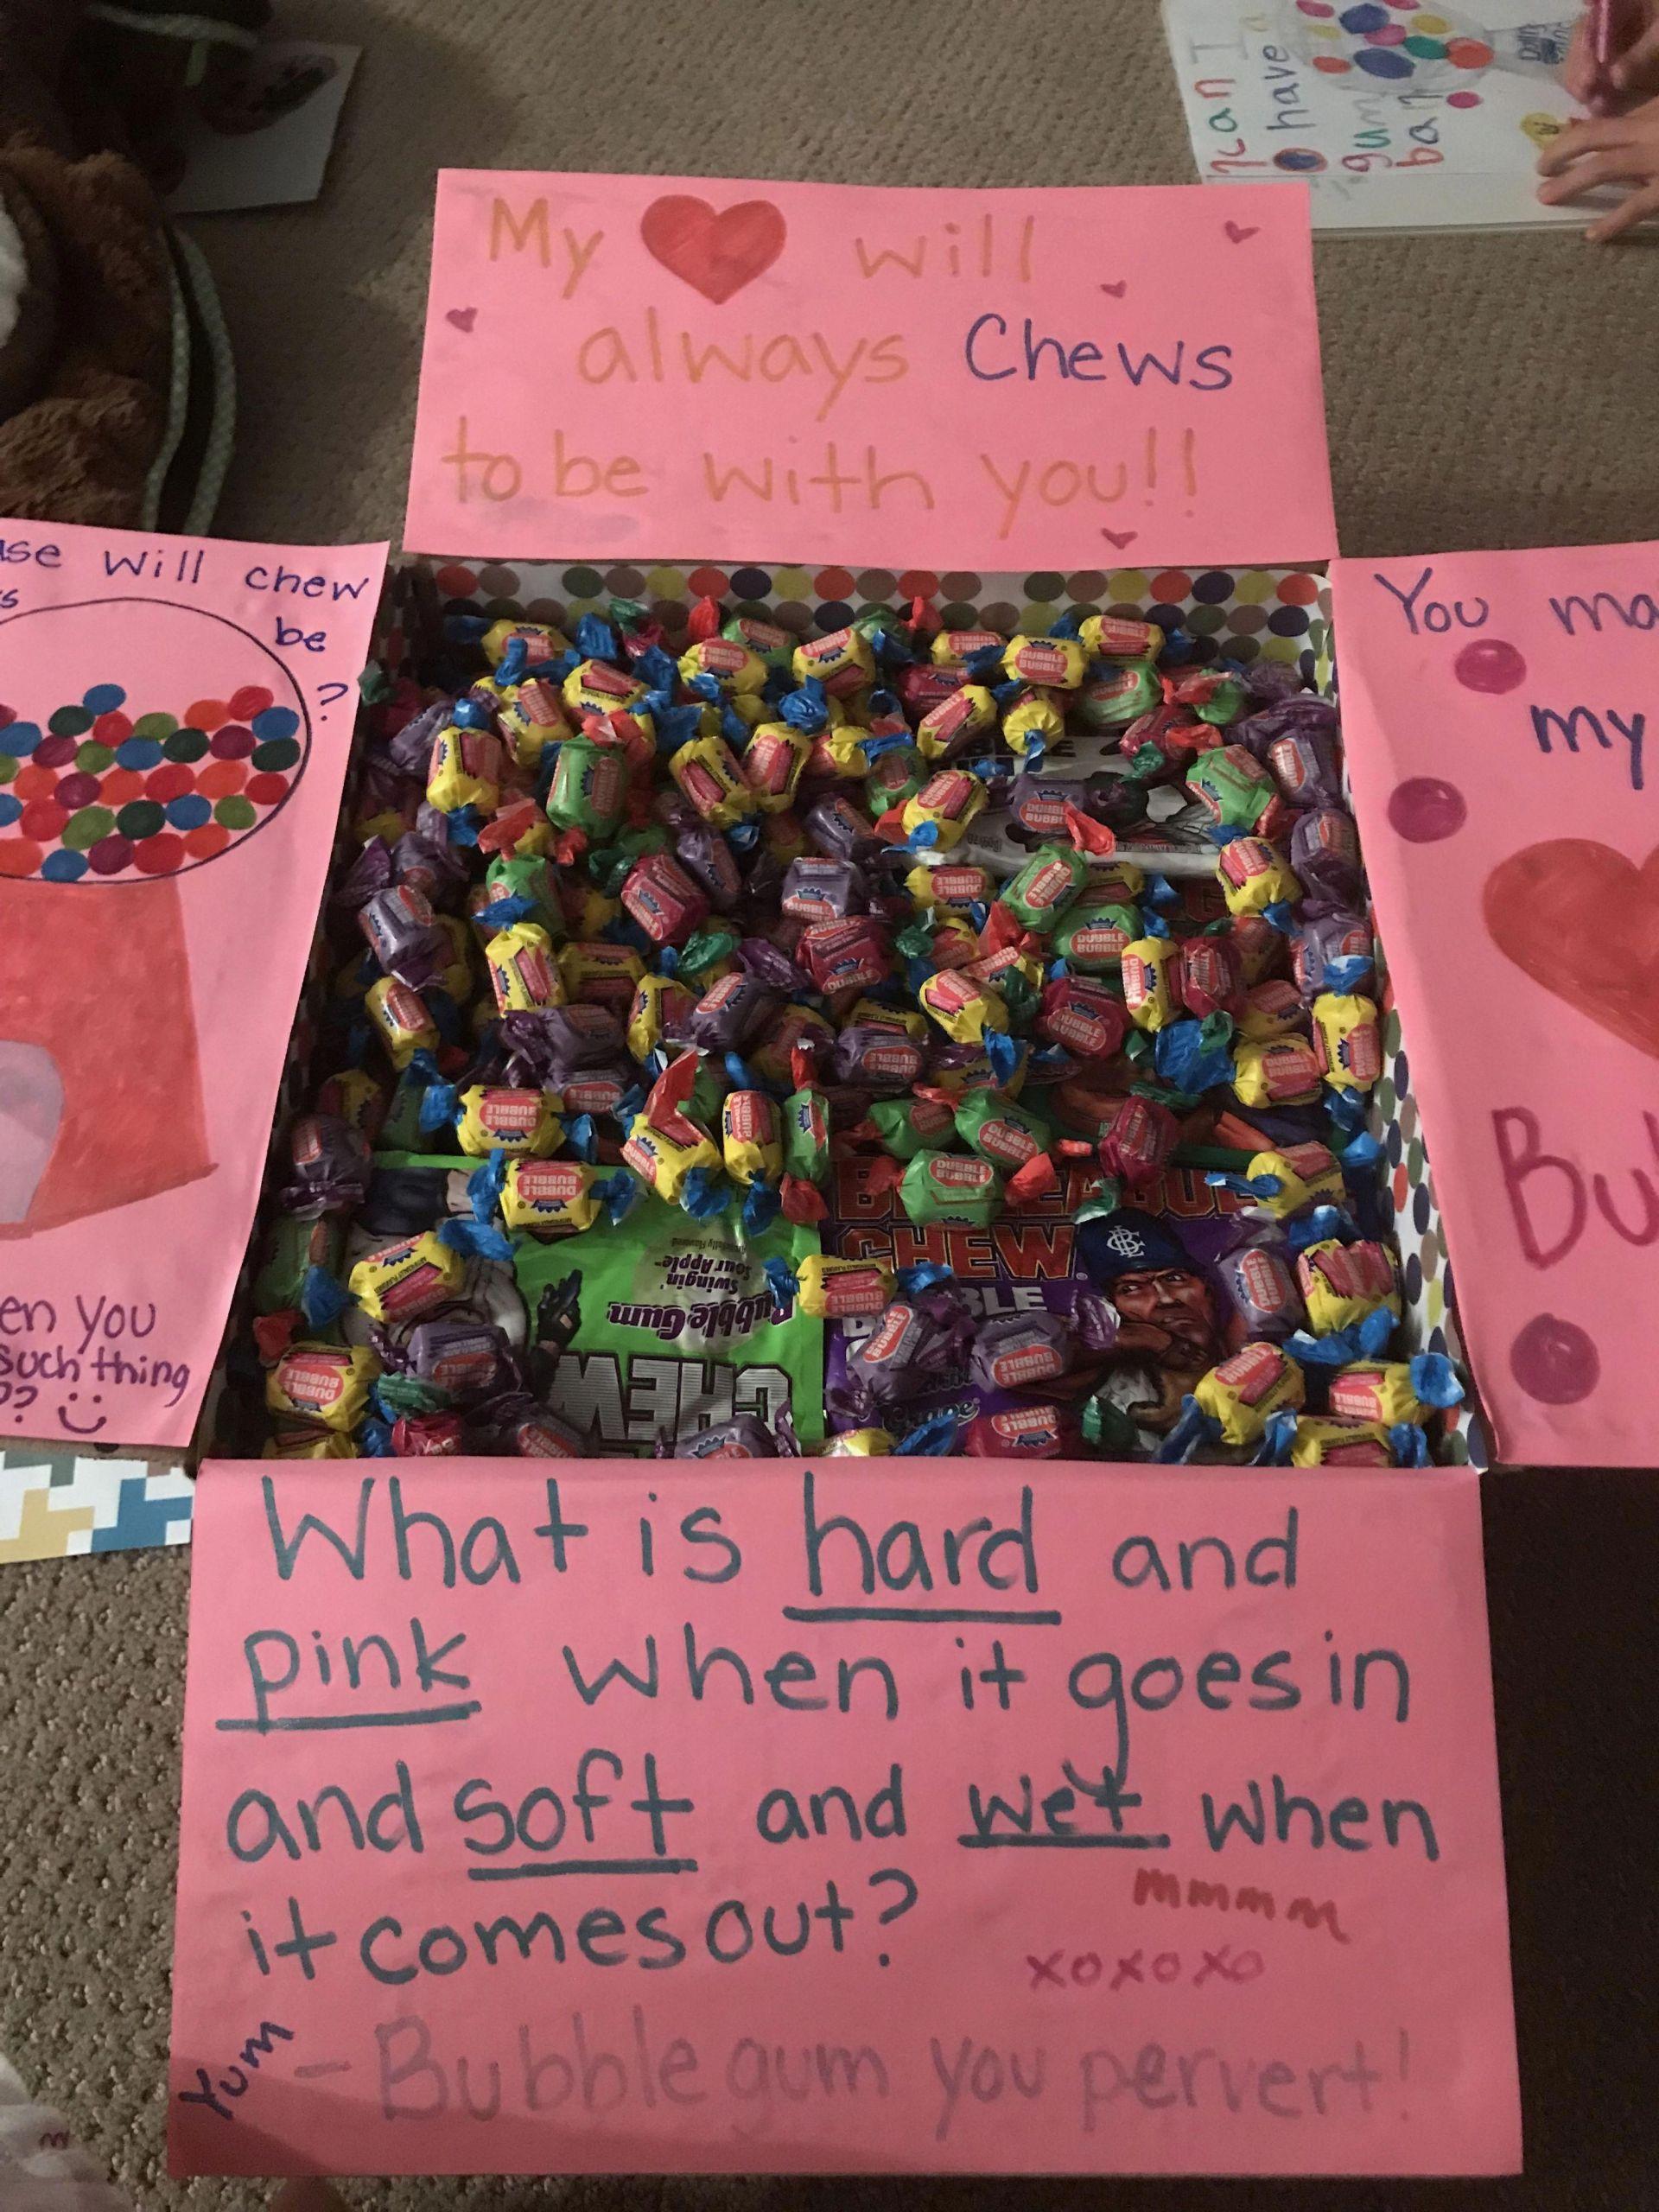 Birthday Gift Ideas For Your Girlfriend  DIY Gift Ideas for your Girlfriend on her Birthday